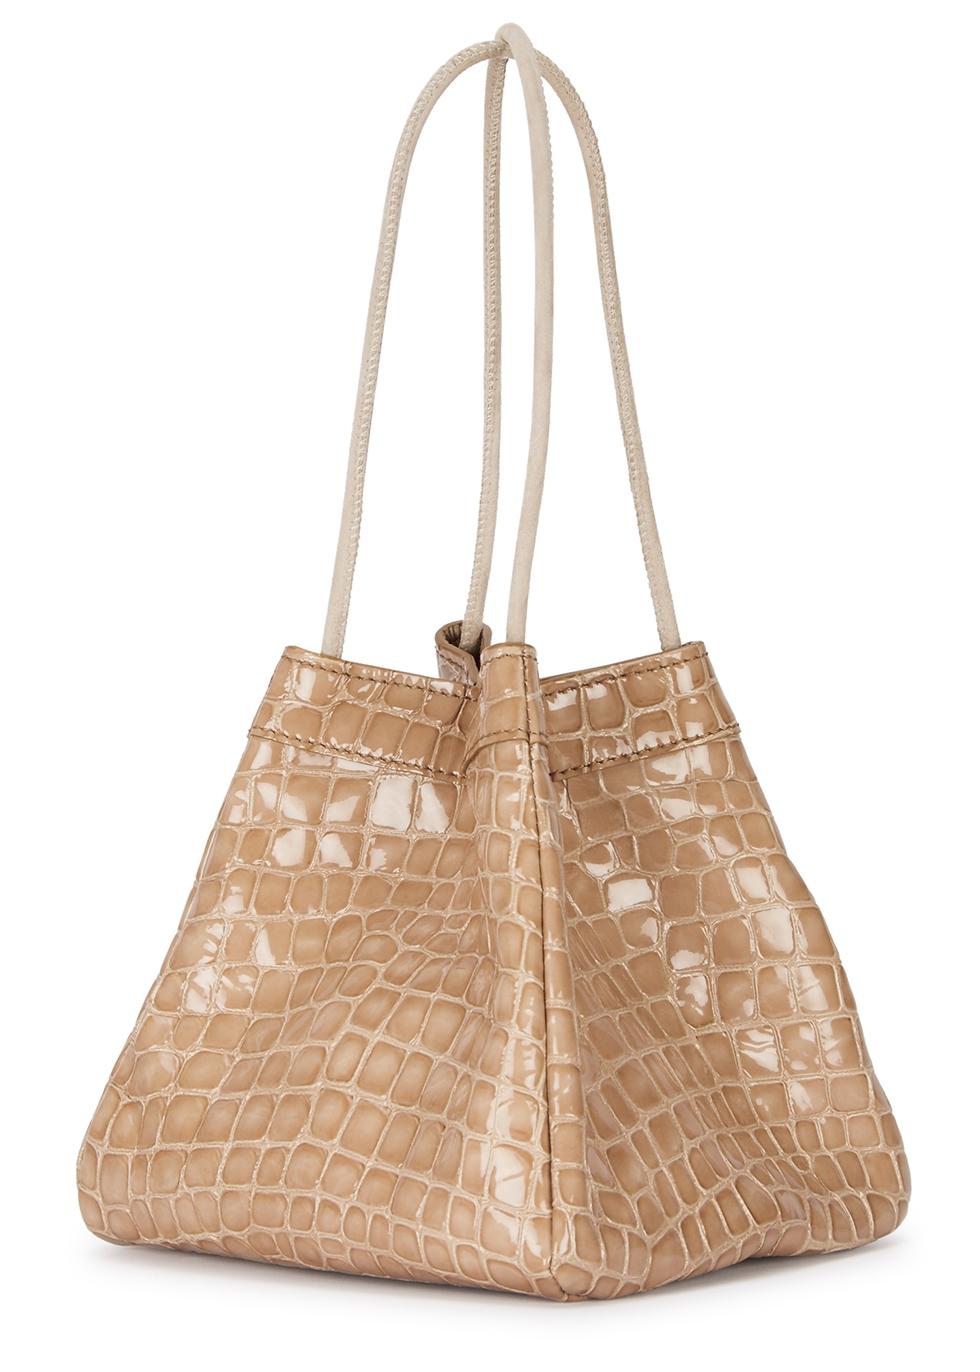 Rita taupe leather mini top-handle bag - Rejina Pyo